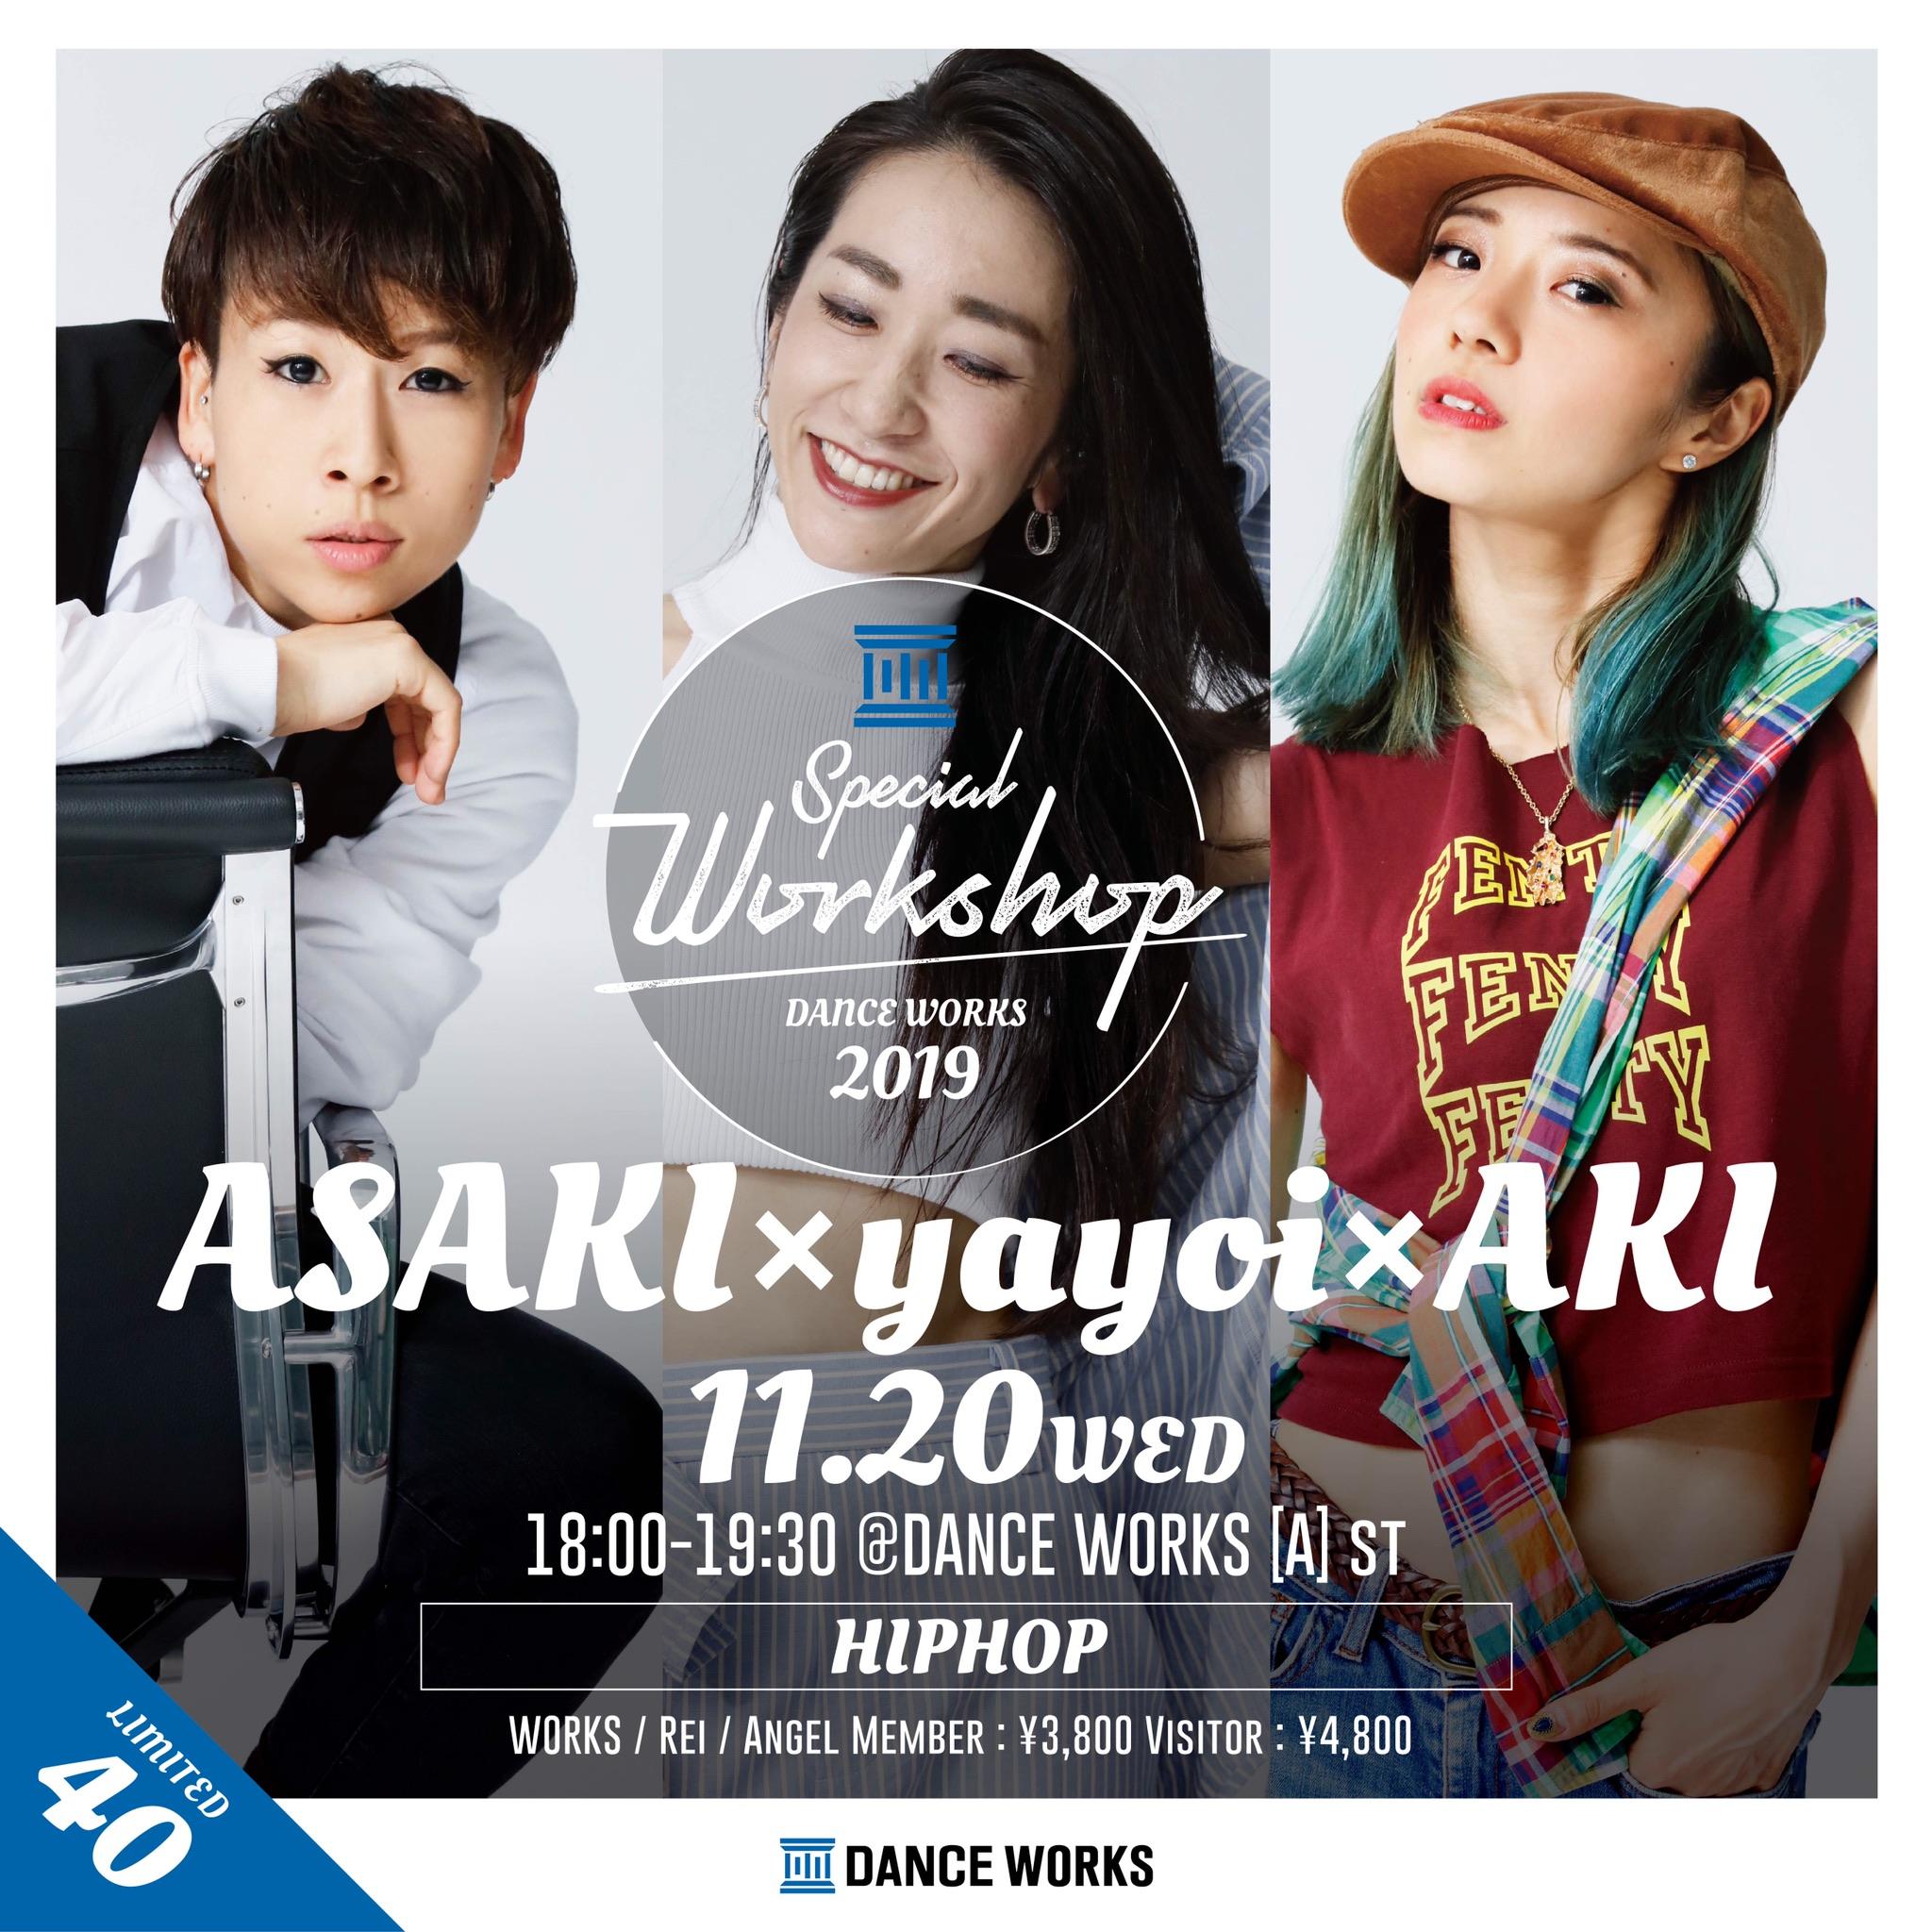 【ASAKI & yayoi & AKI】ダンスワークショップ開催!!<